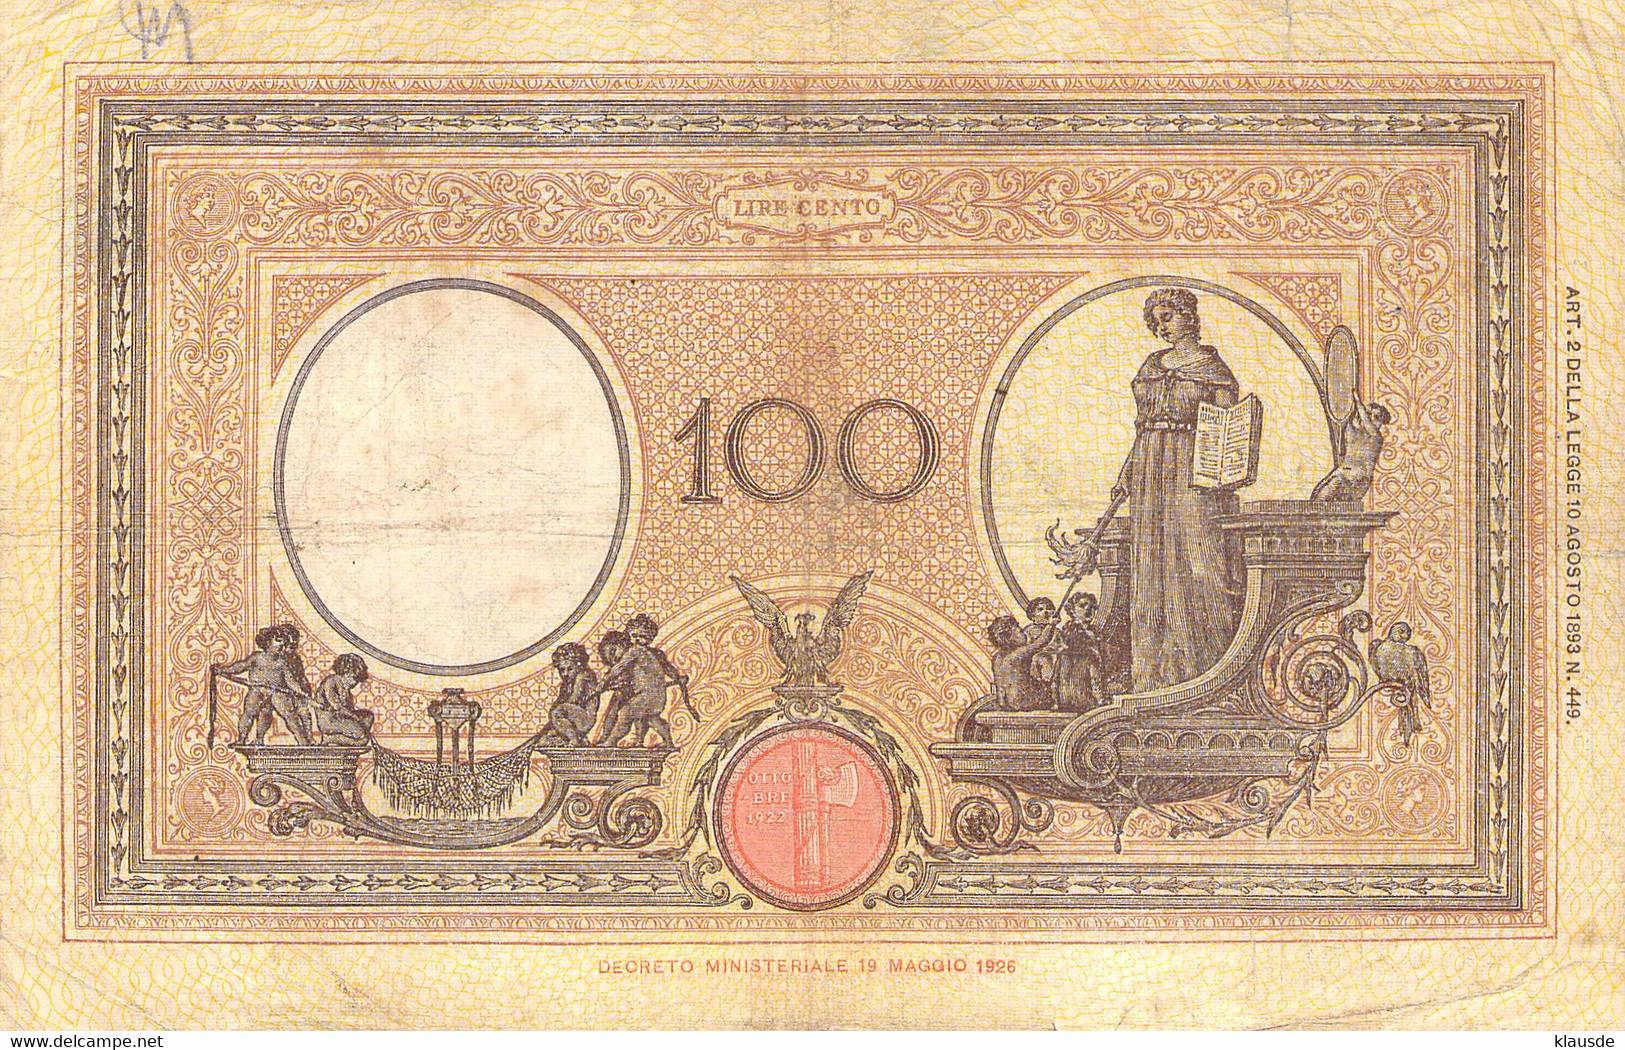 Italien 100 Lire Geldschein Banknote 1925 VG/G III - 100 Lire